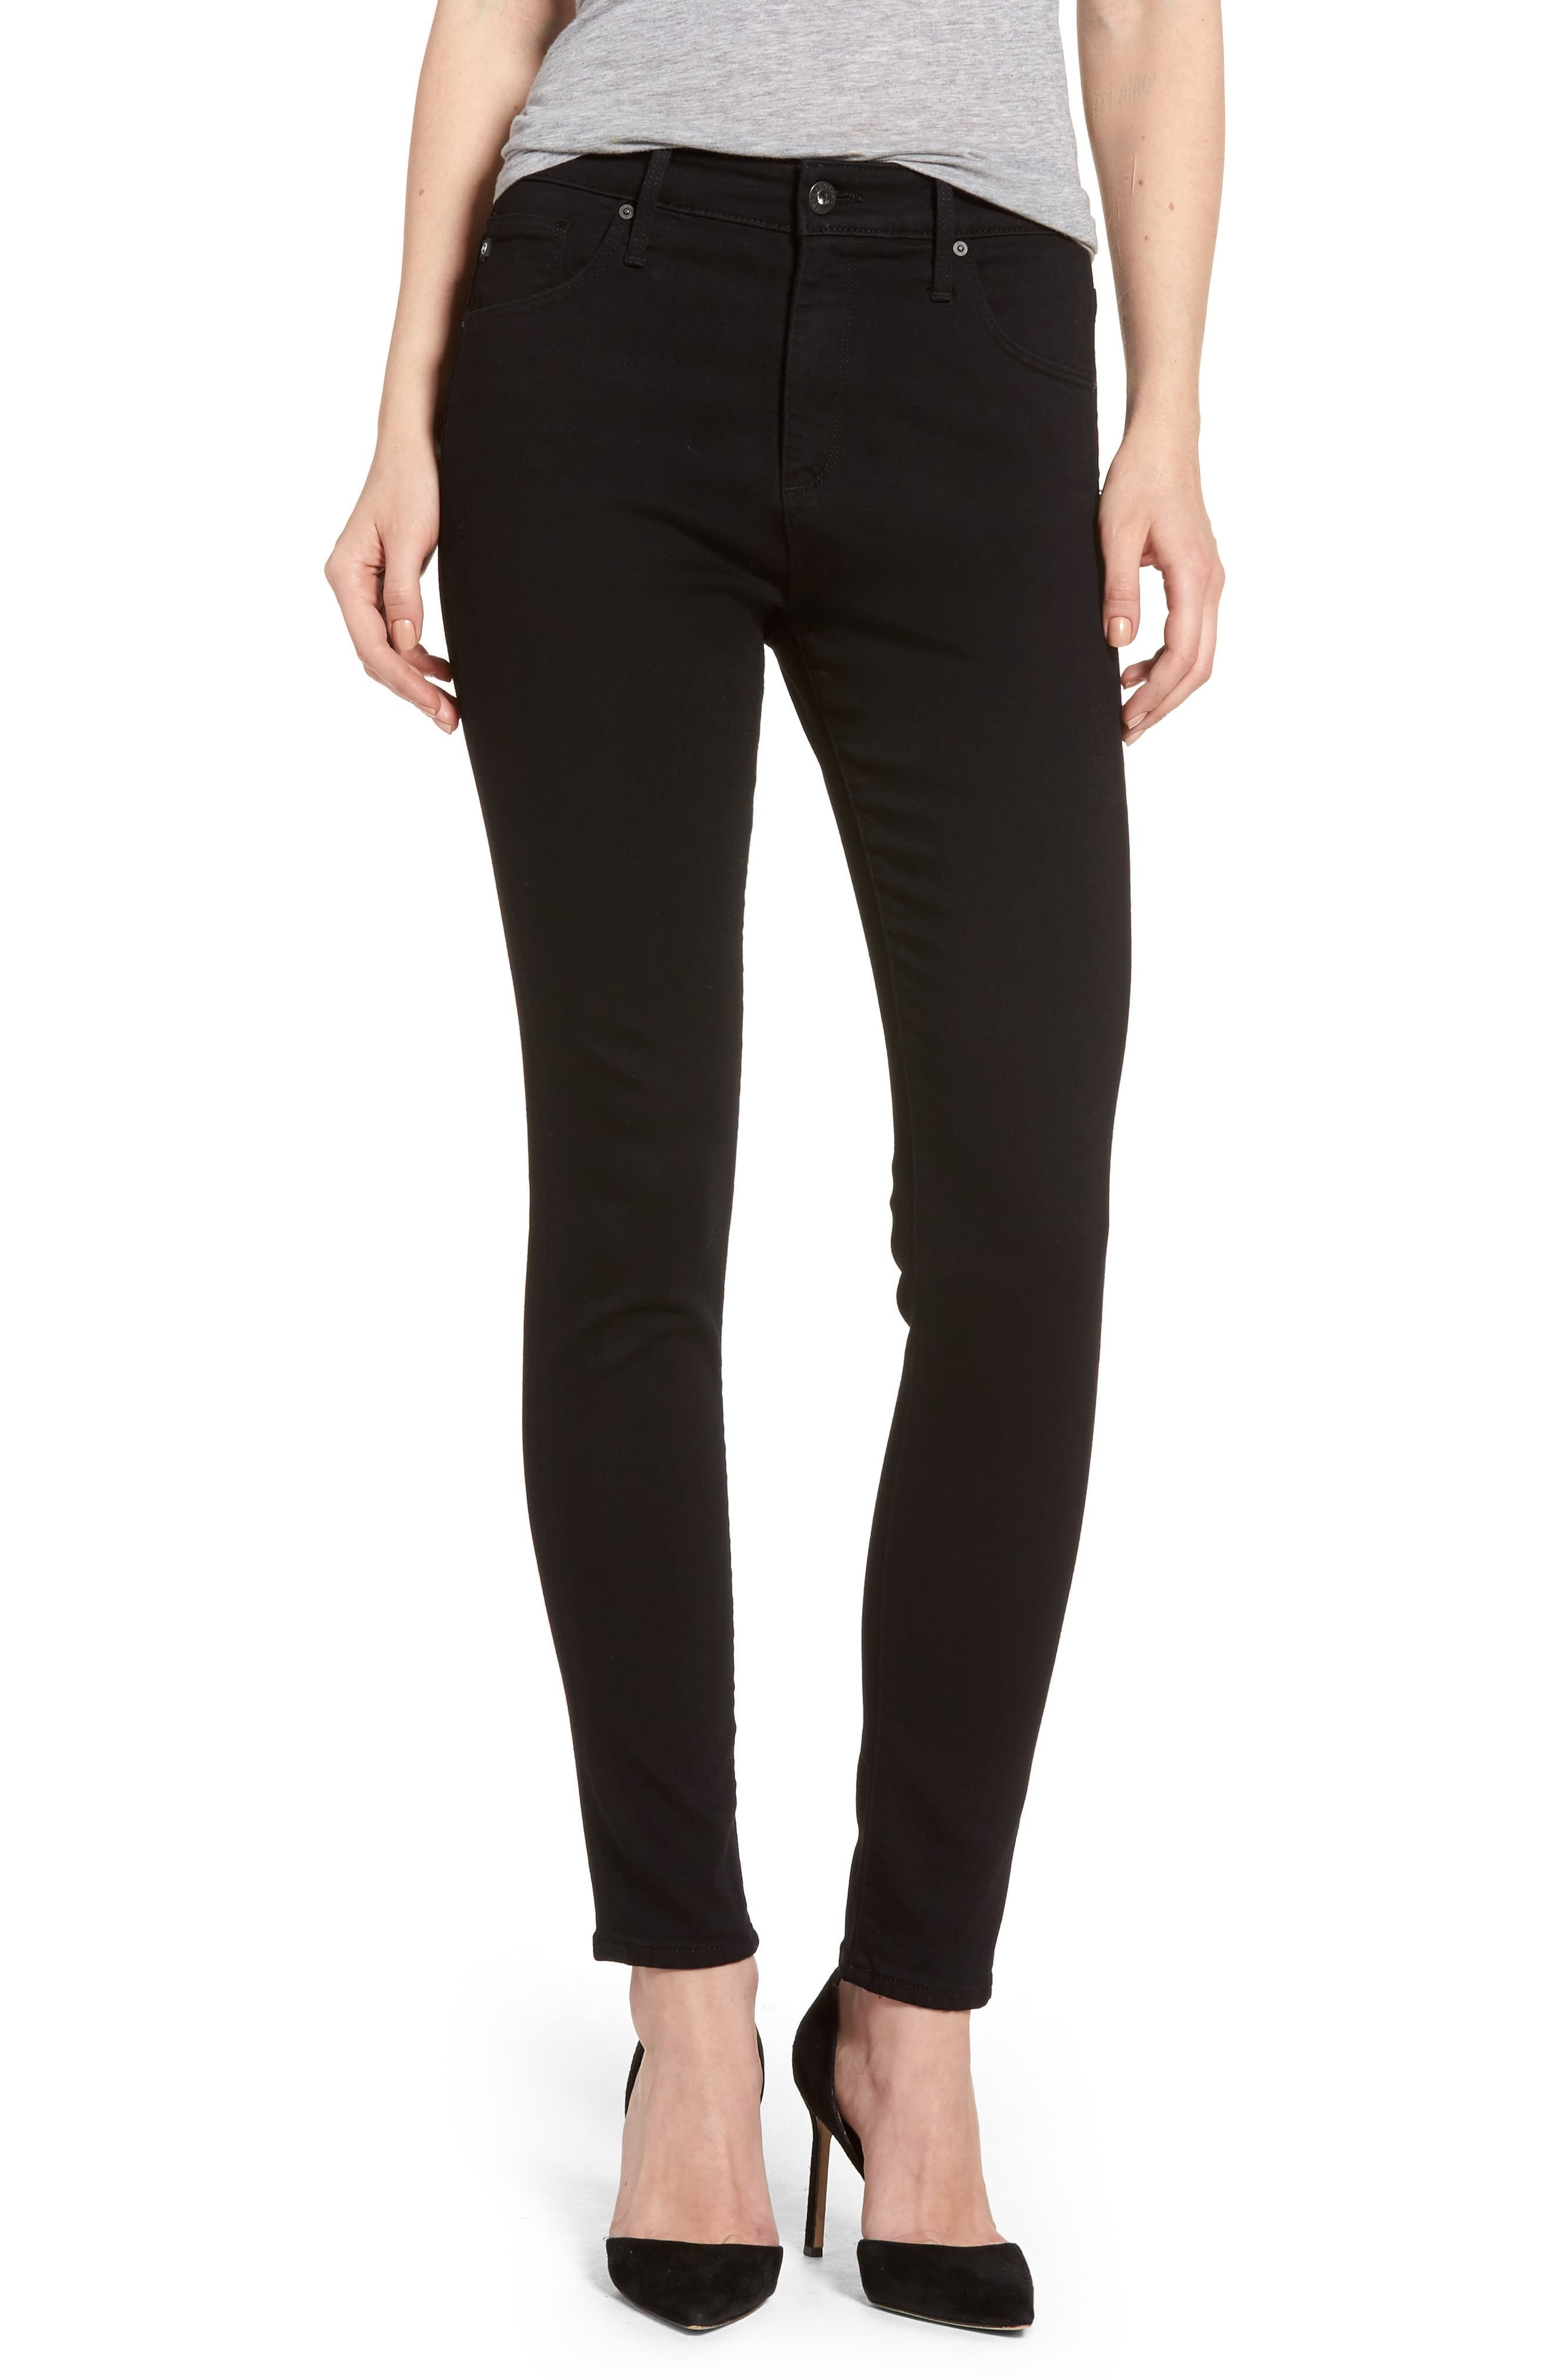 7727b73662233e Women's Ag Farrah High Waist Ankle Skinny Jeans, Size 33 - Black (Super  Black) (Nordstrom Exclusive)